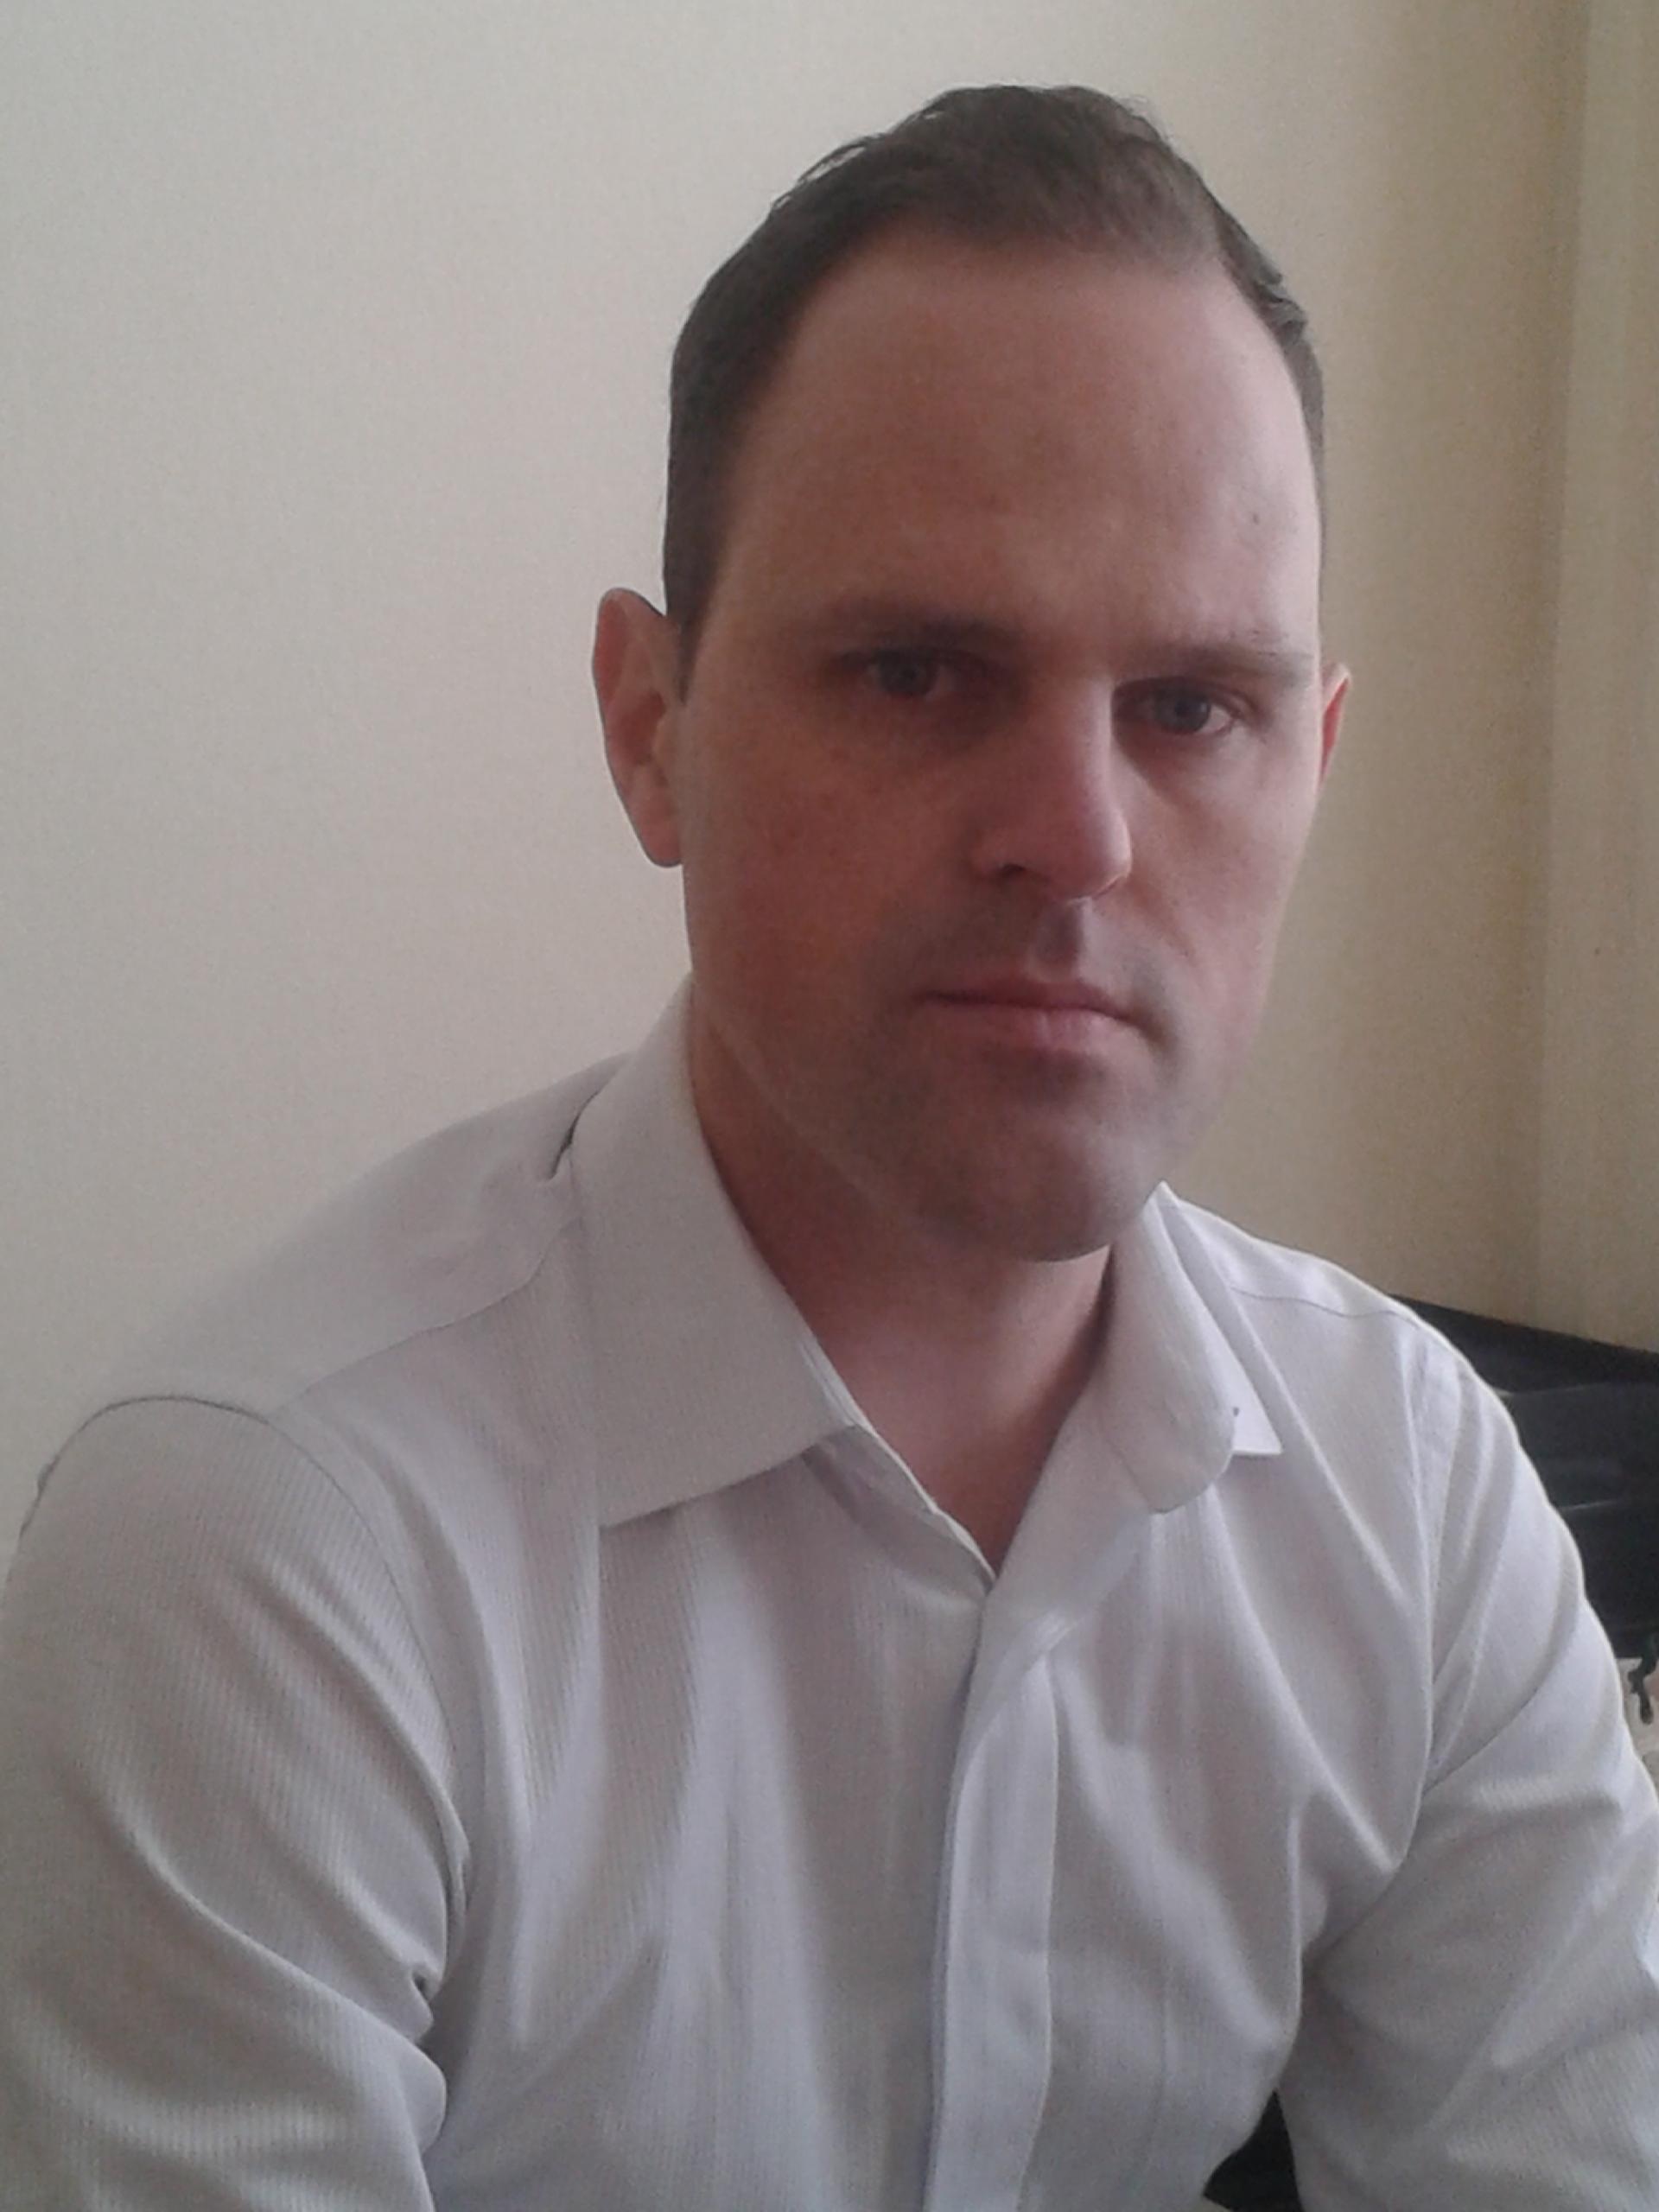 Dušan Ďurdík, Factory Logistics Manager, Nestlé